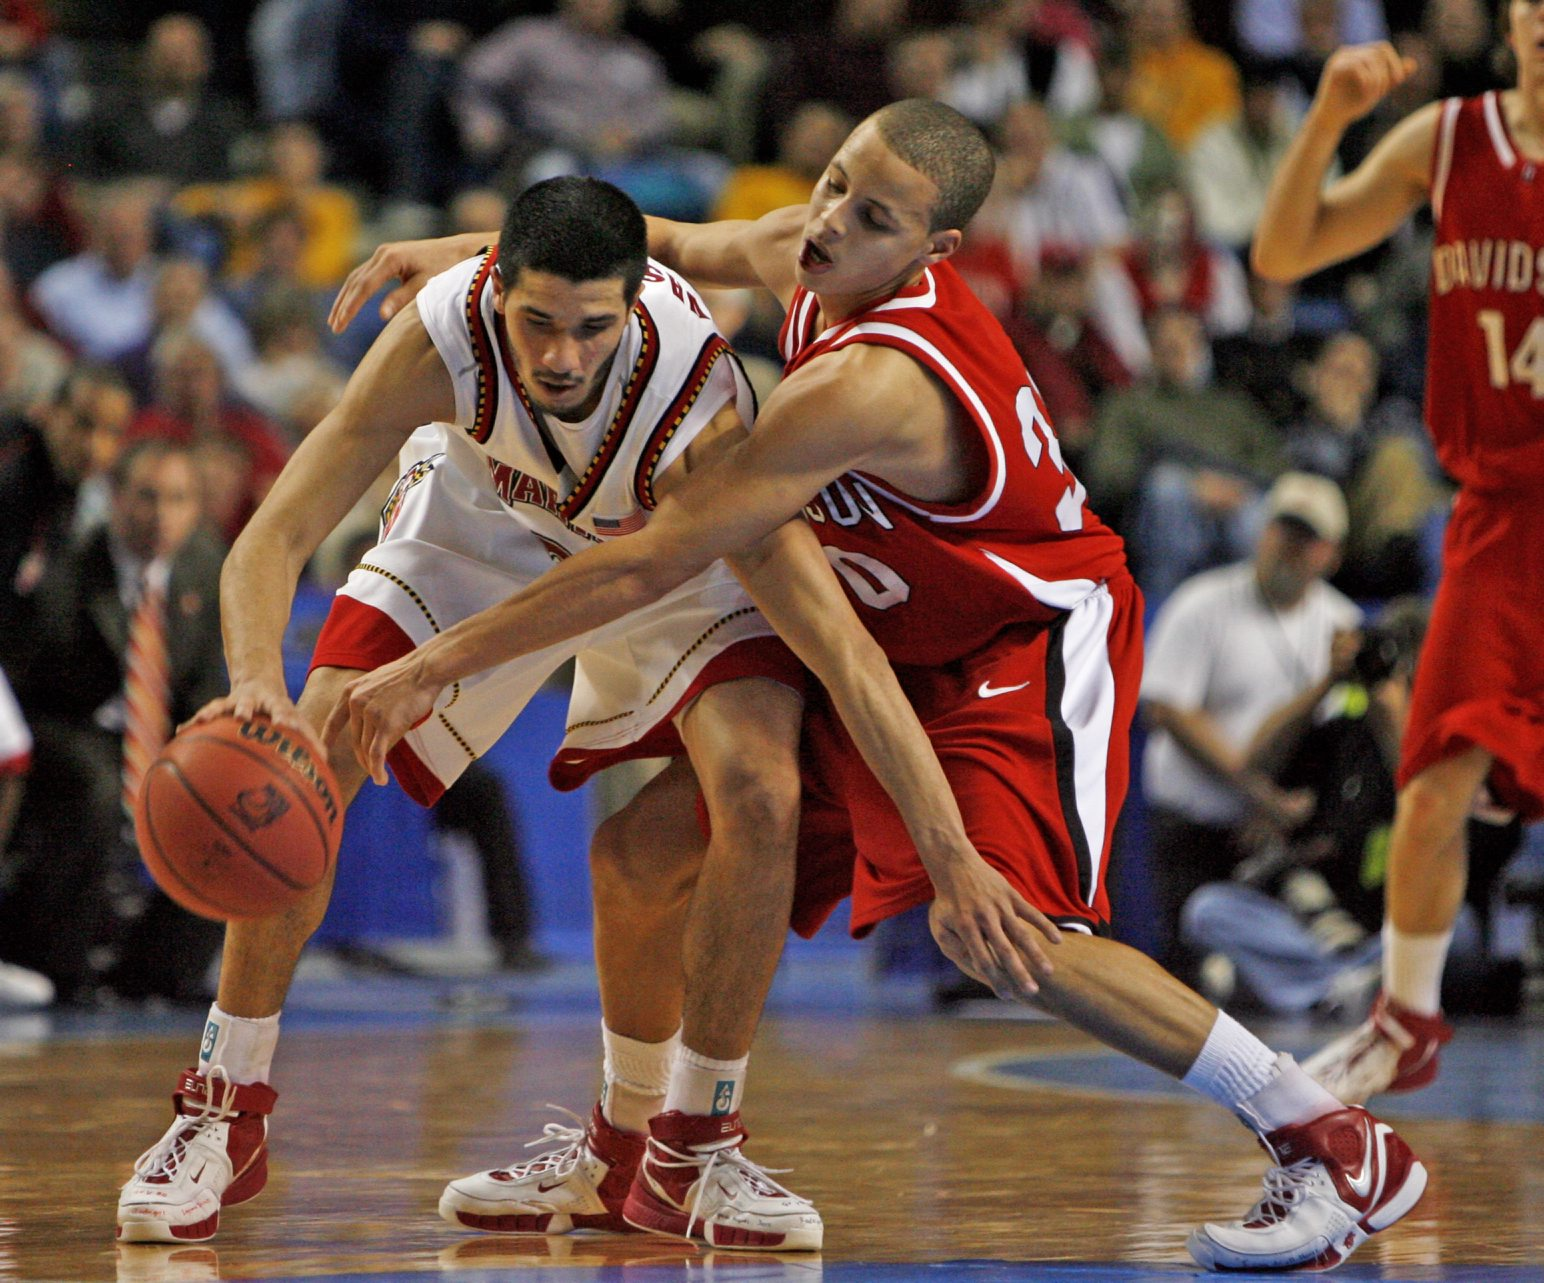 Maryland   Greivis Vasquez  keeps the ball away from  Davidson's Steph Curry. (James P. McCoy/Buffalo News)